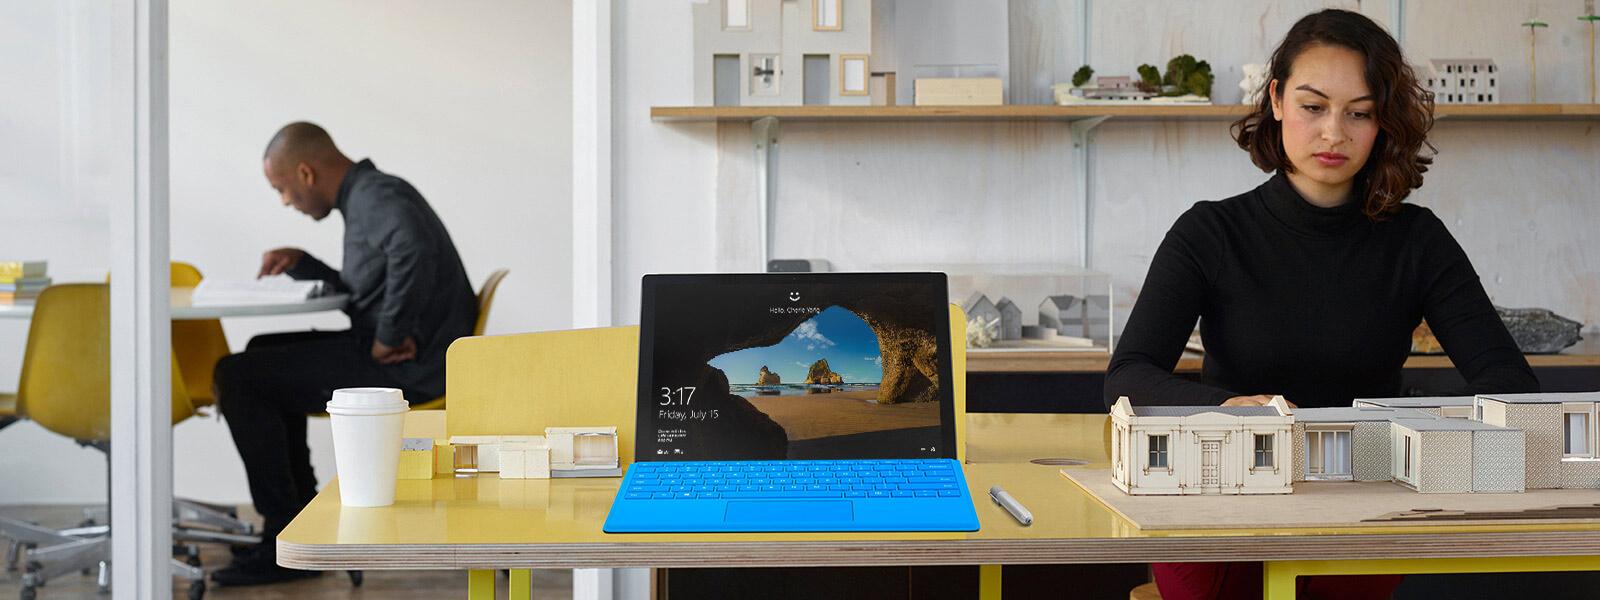 Surface Pro 4 مع قلم Surface Pen على طاولة.